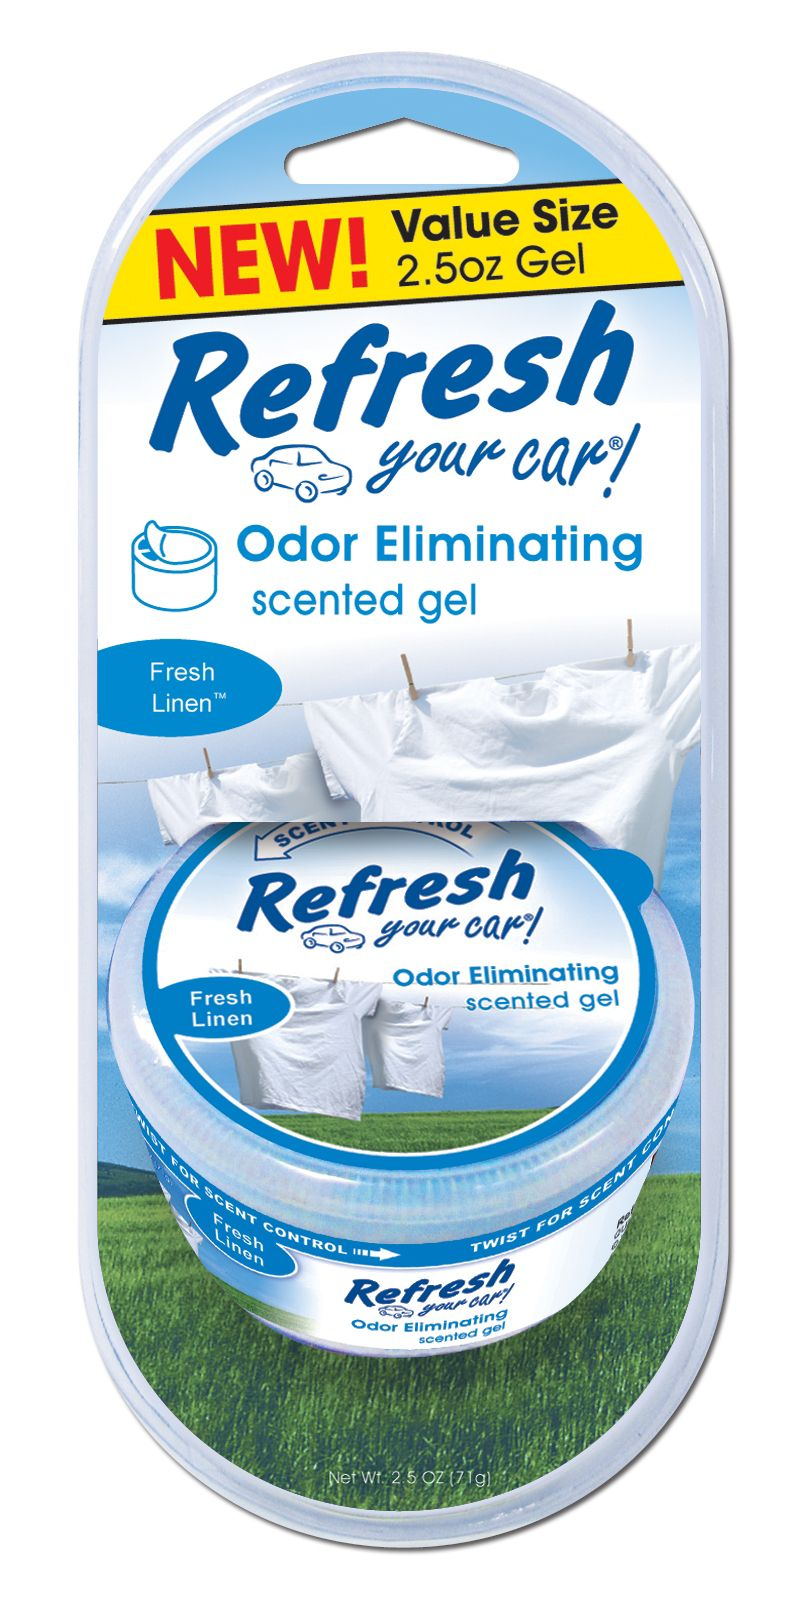 Refresh Fresh Linen Scent Gel Can Air Freshener